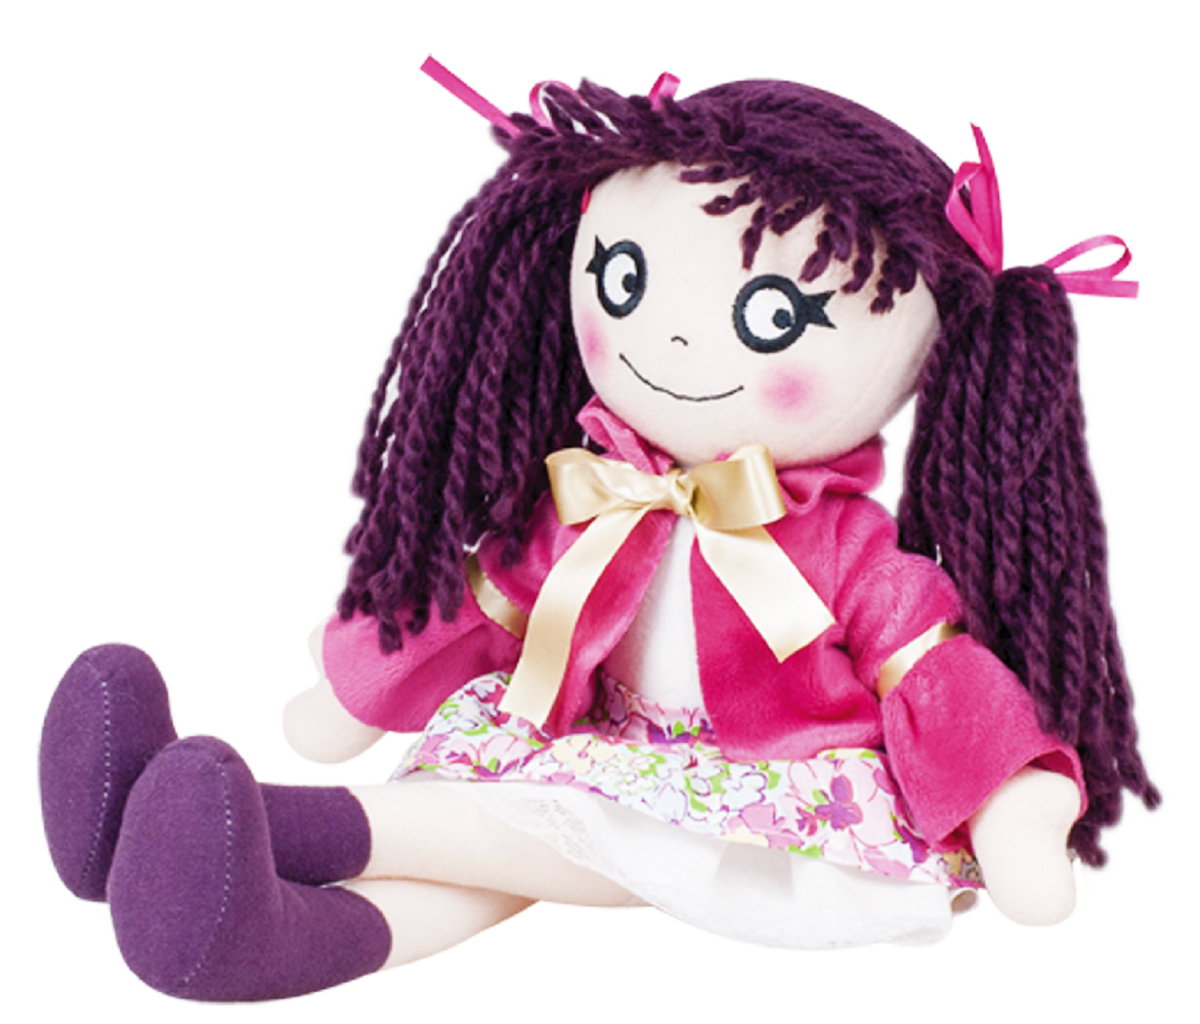 Фото - Little You Мягкая кукла Анюта little you мягкая кукла кейт цвет одежды голубой желтый